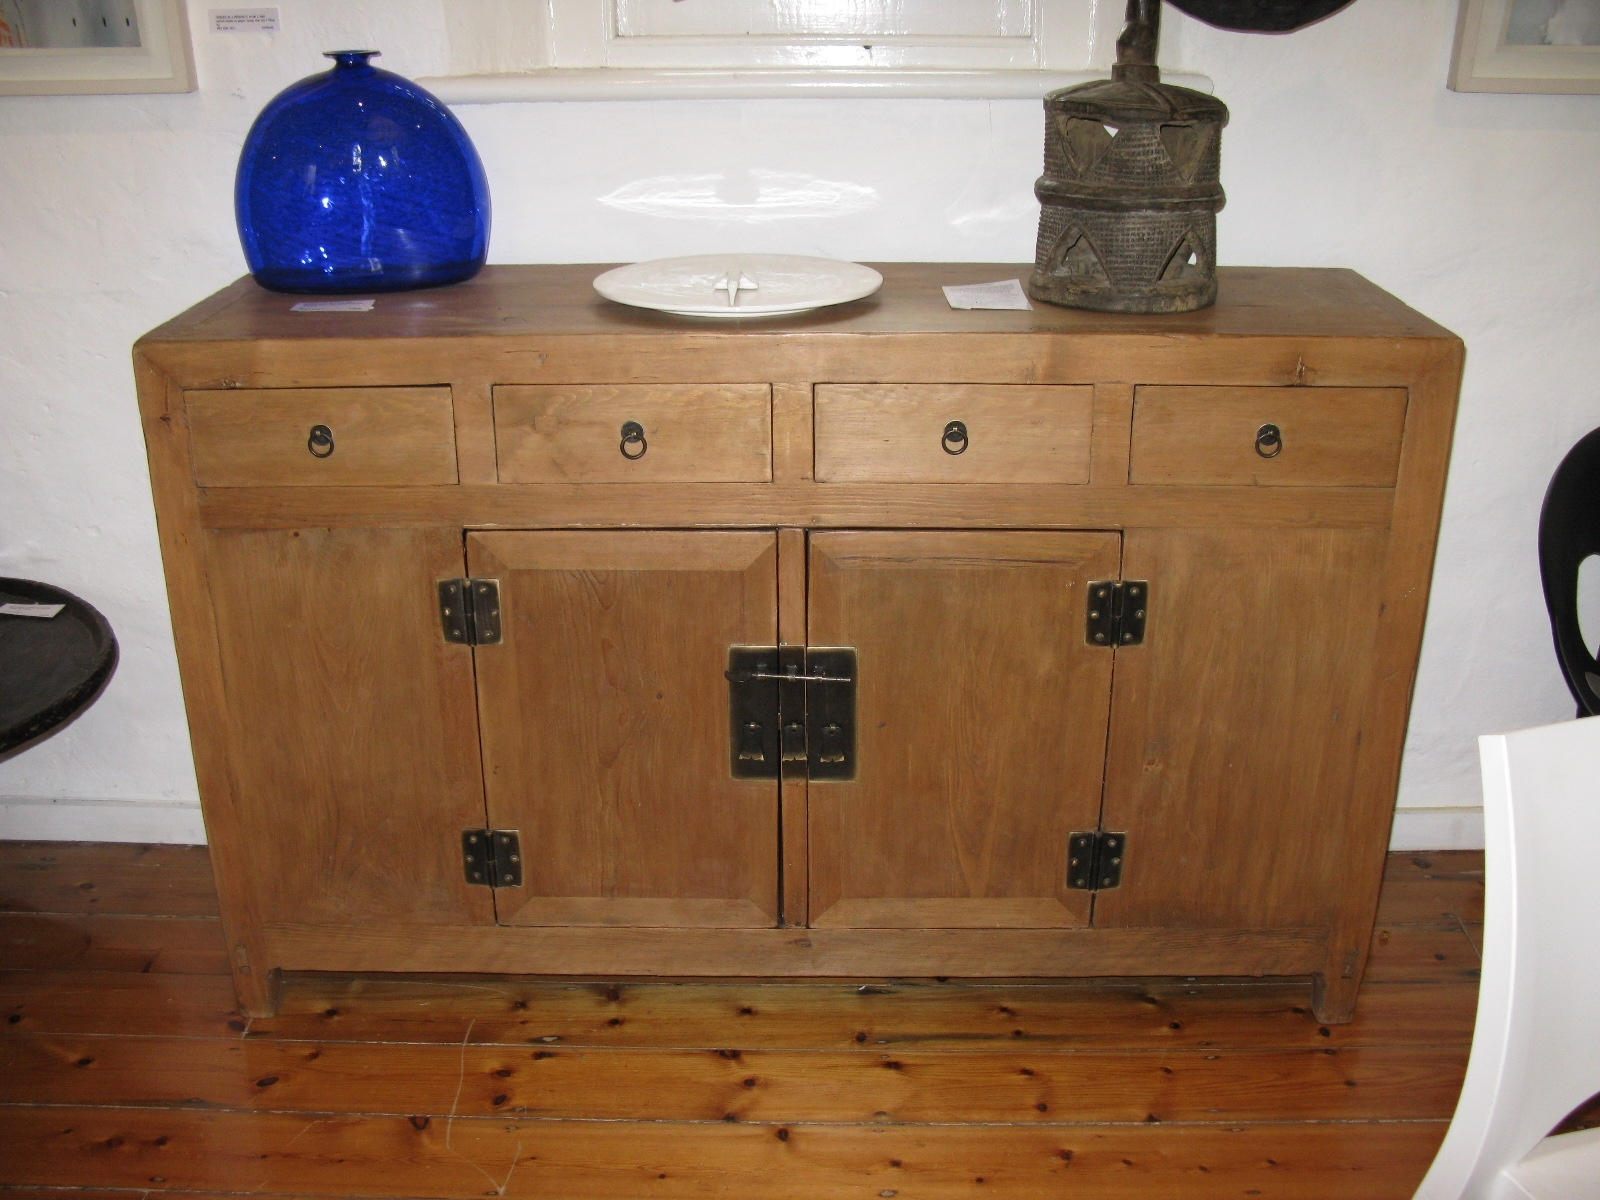 Antique Sideboards | Gallery Categories | Aptos Cruz with Antique Walnut Finish 2-Door/4-Drawer Sideboards (Image 3 of 30)